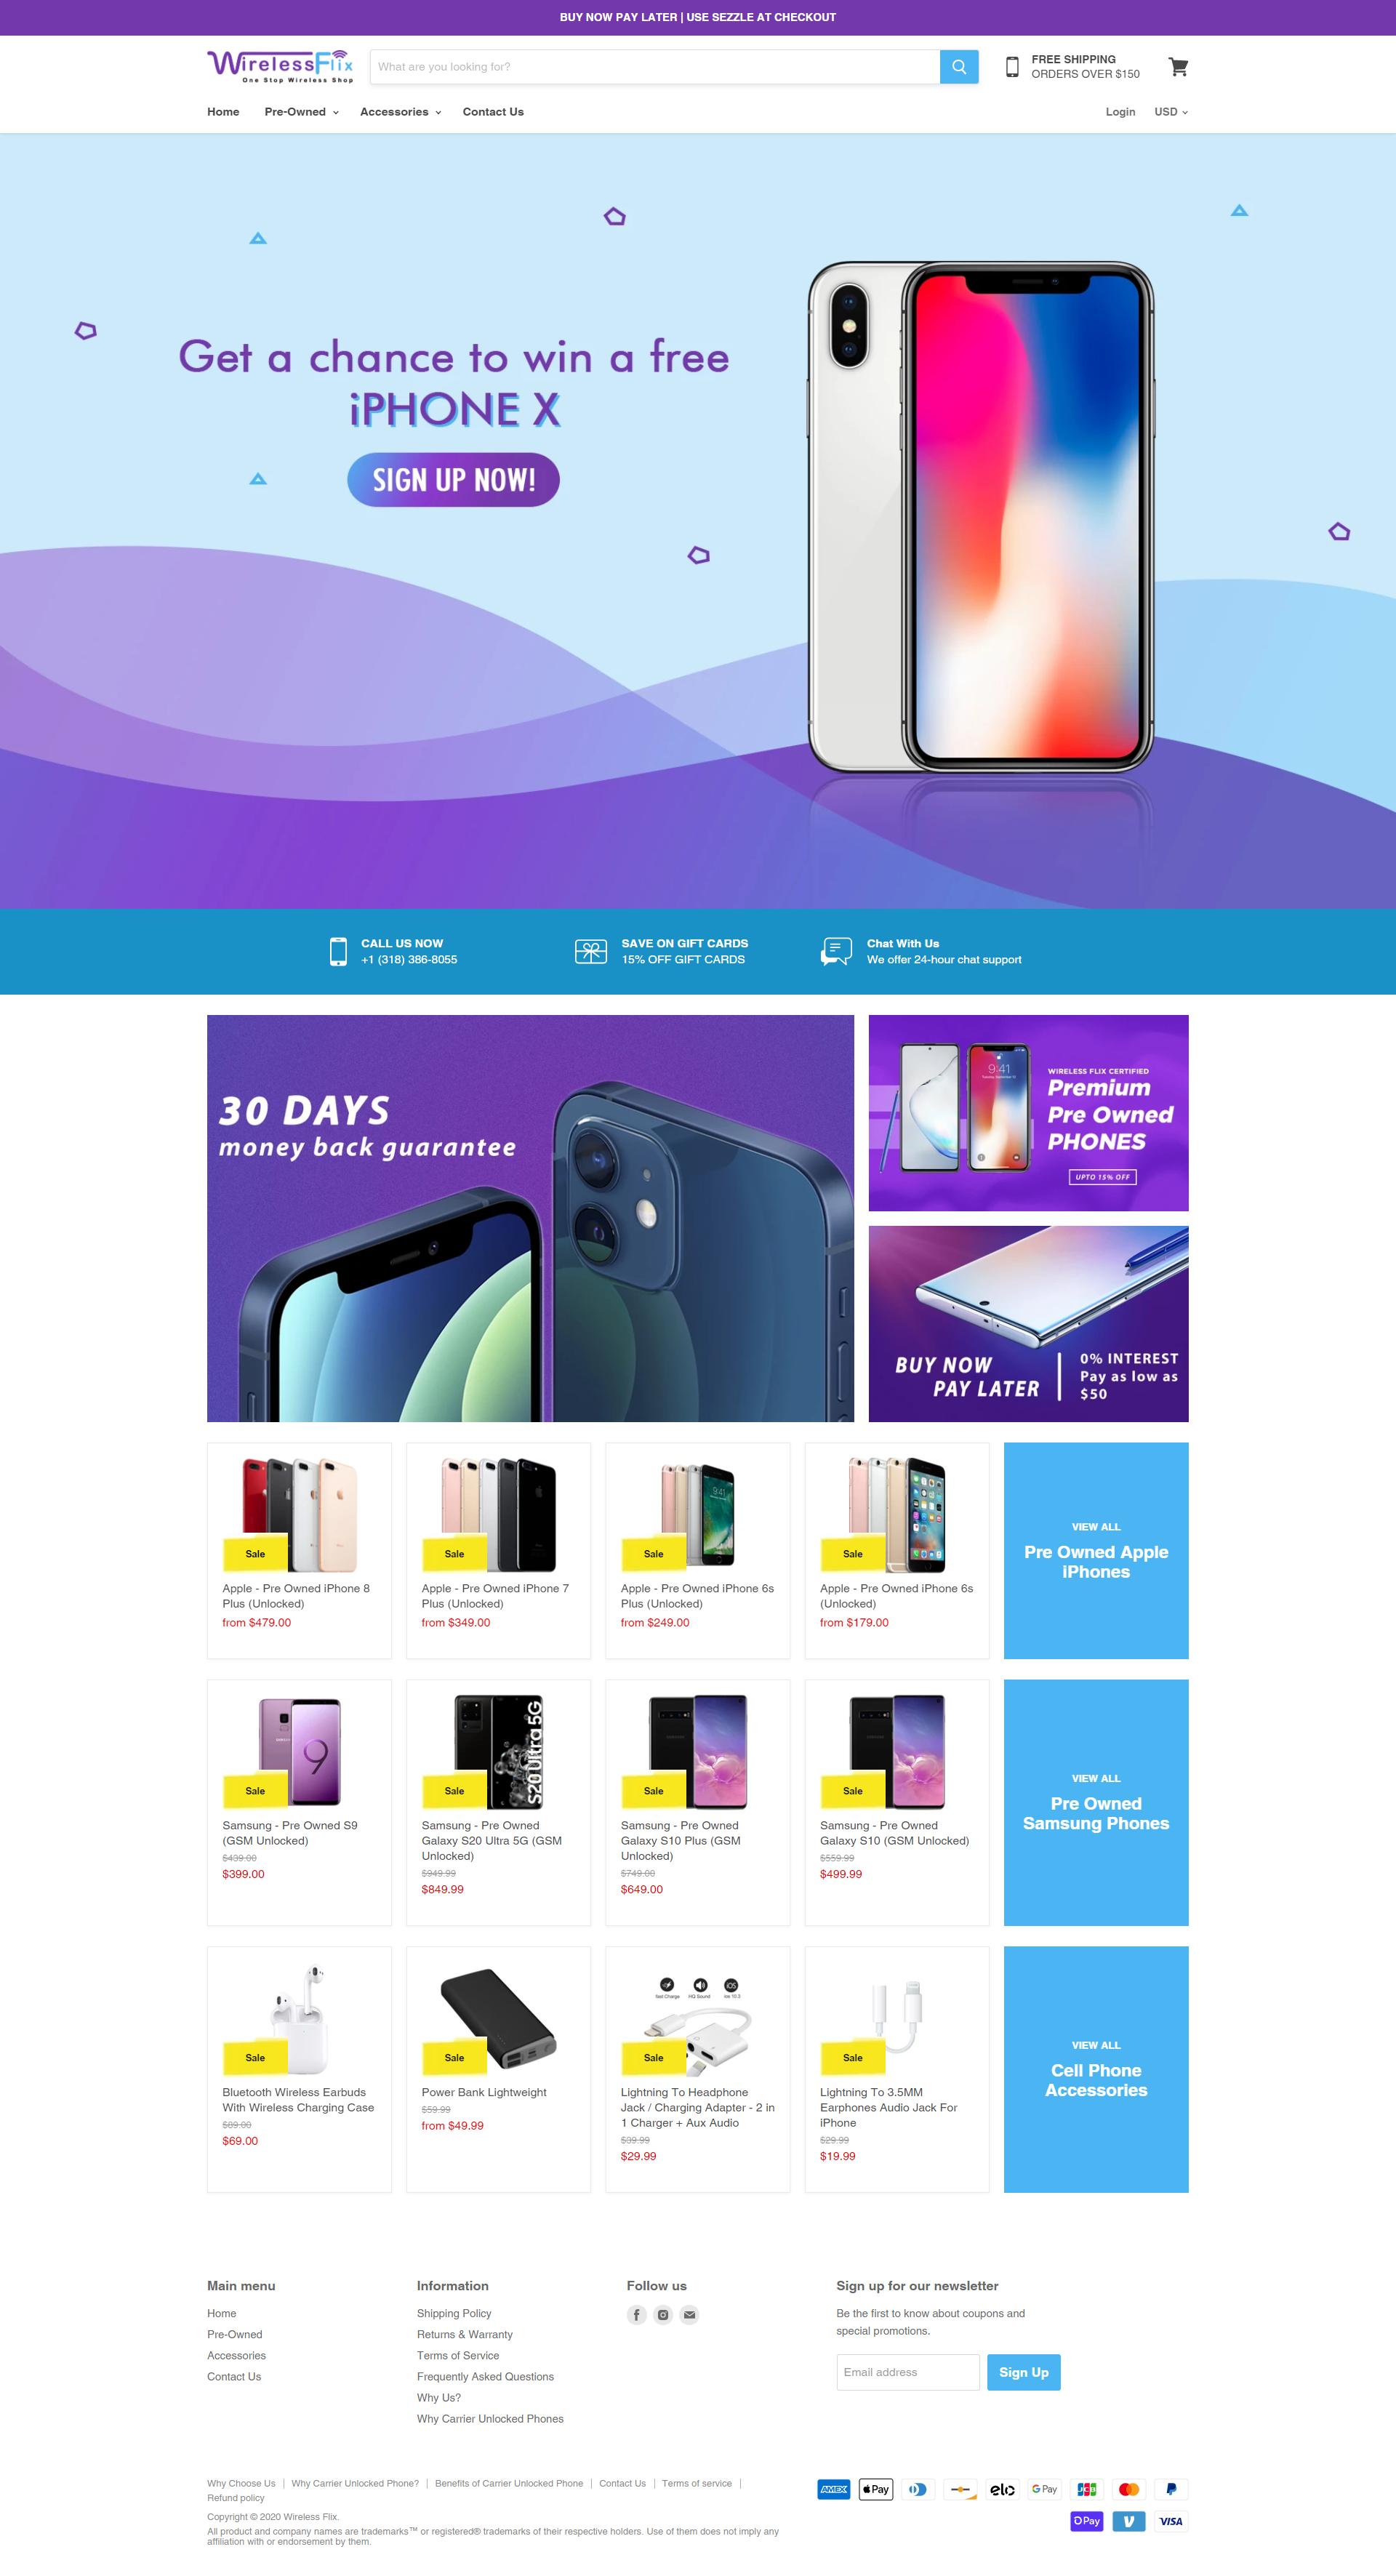 Wirelessflix.com